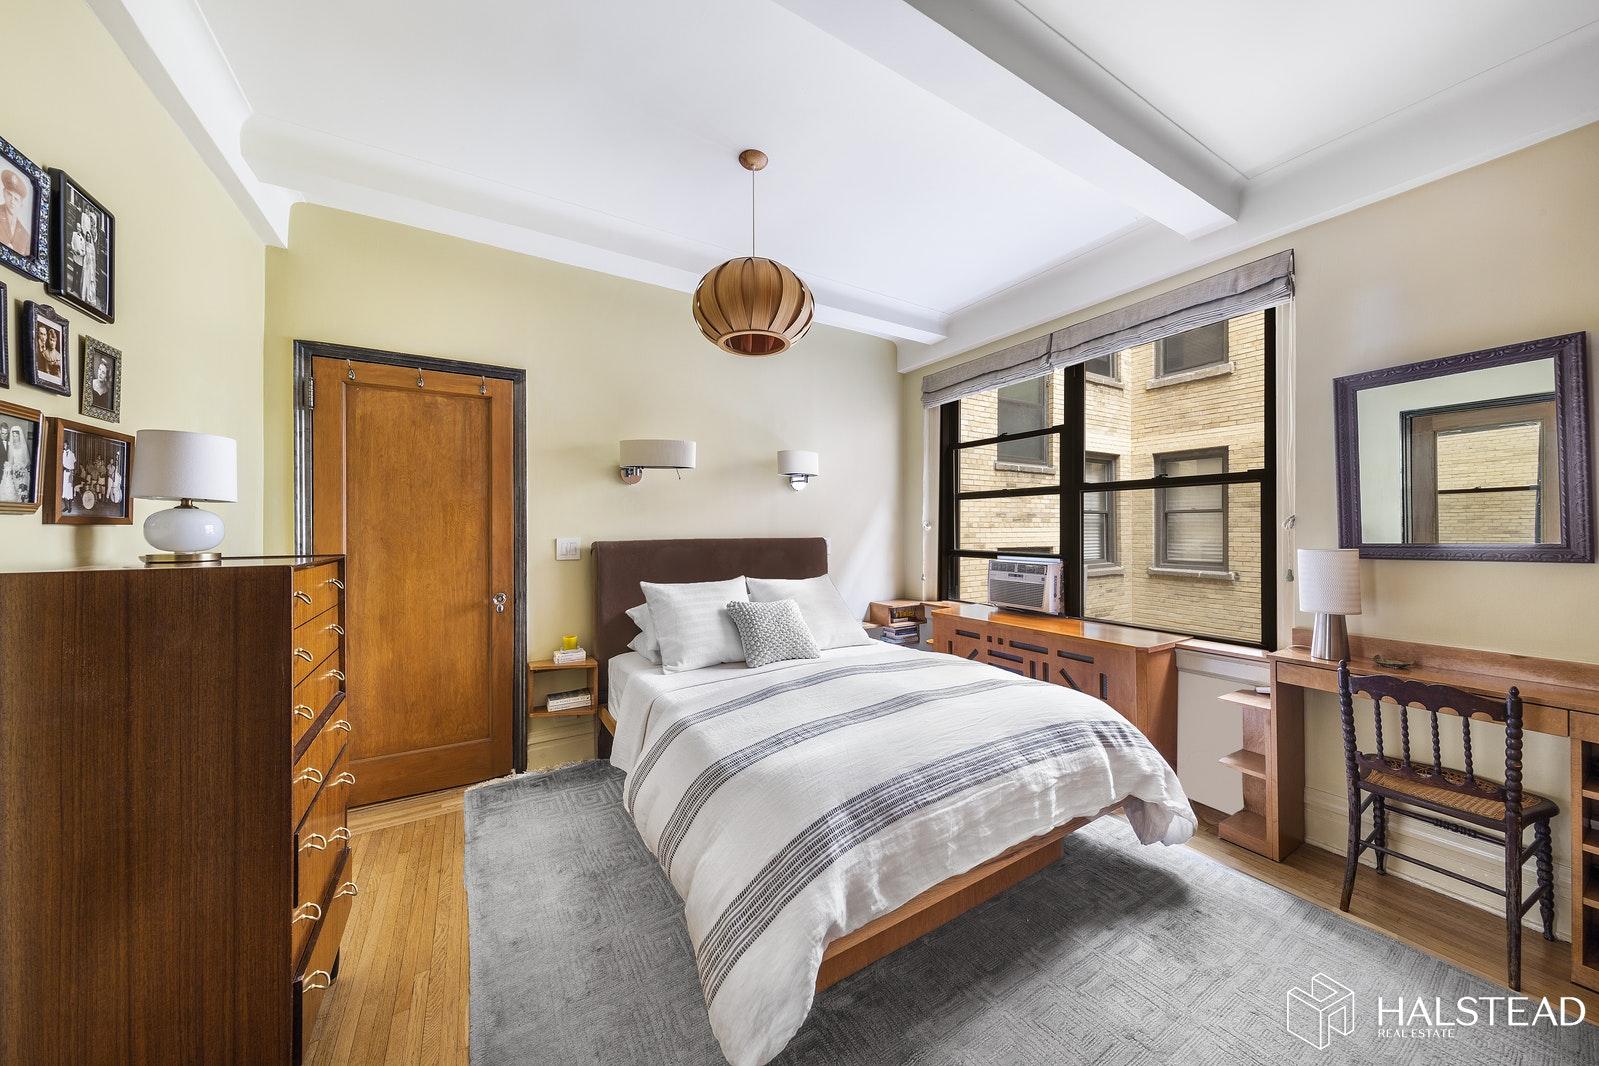 243 WEST 70TH STREET 5A, Upper West Side, $1,395,000, Web #: 19910405